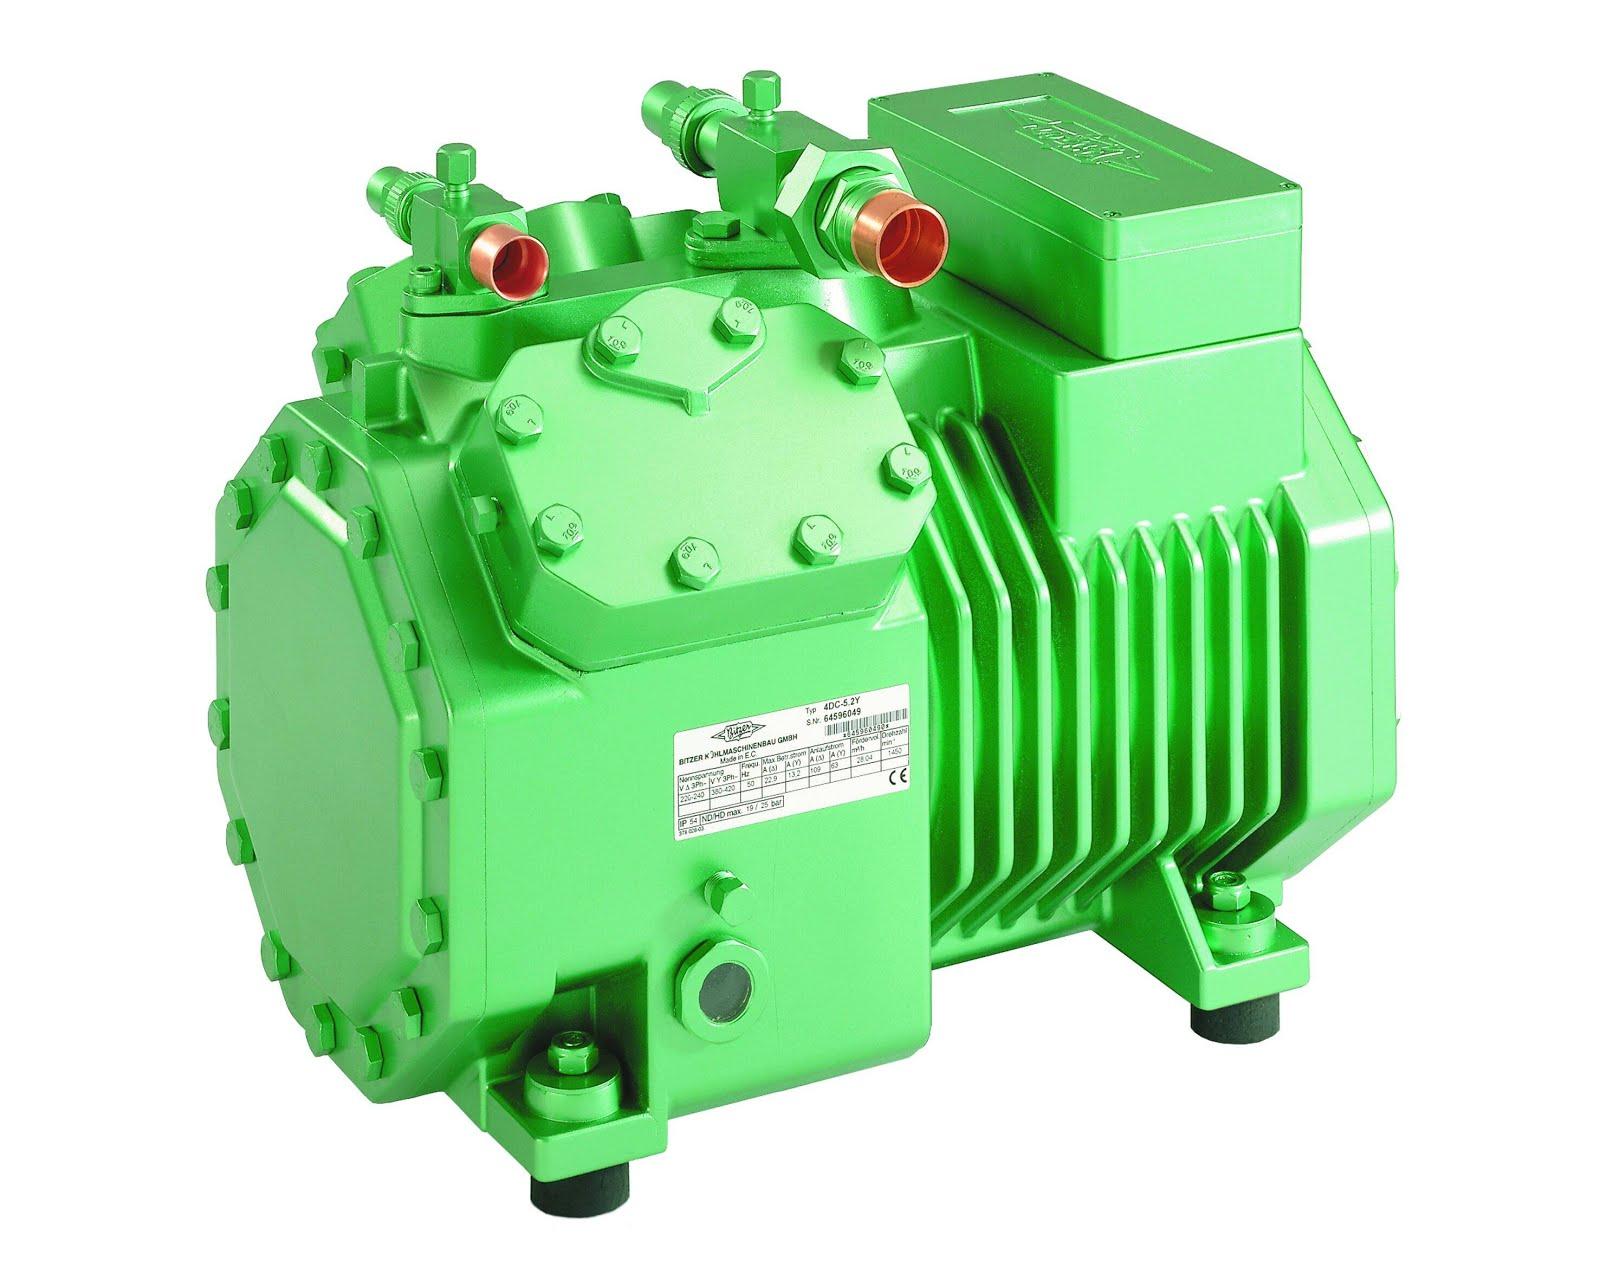 compressor semi hermetique, for coldstorage & water chiller